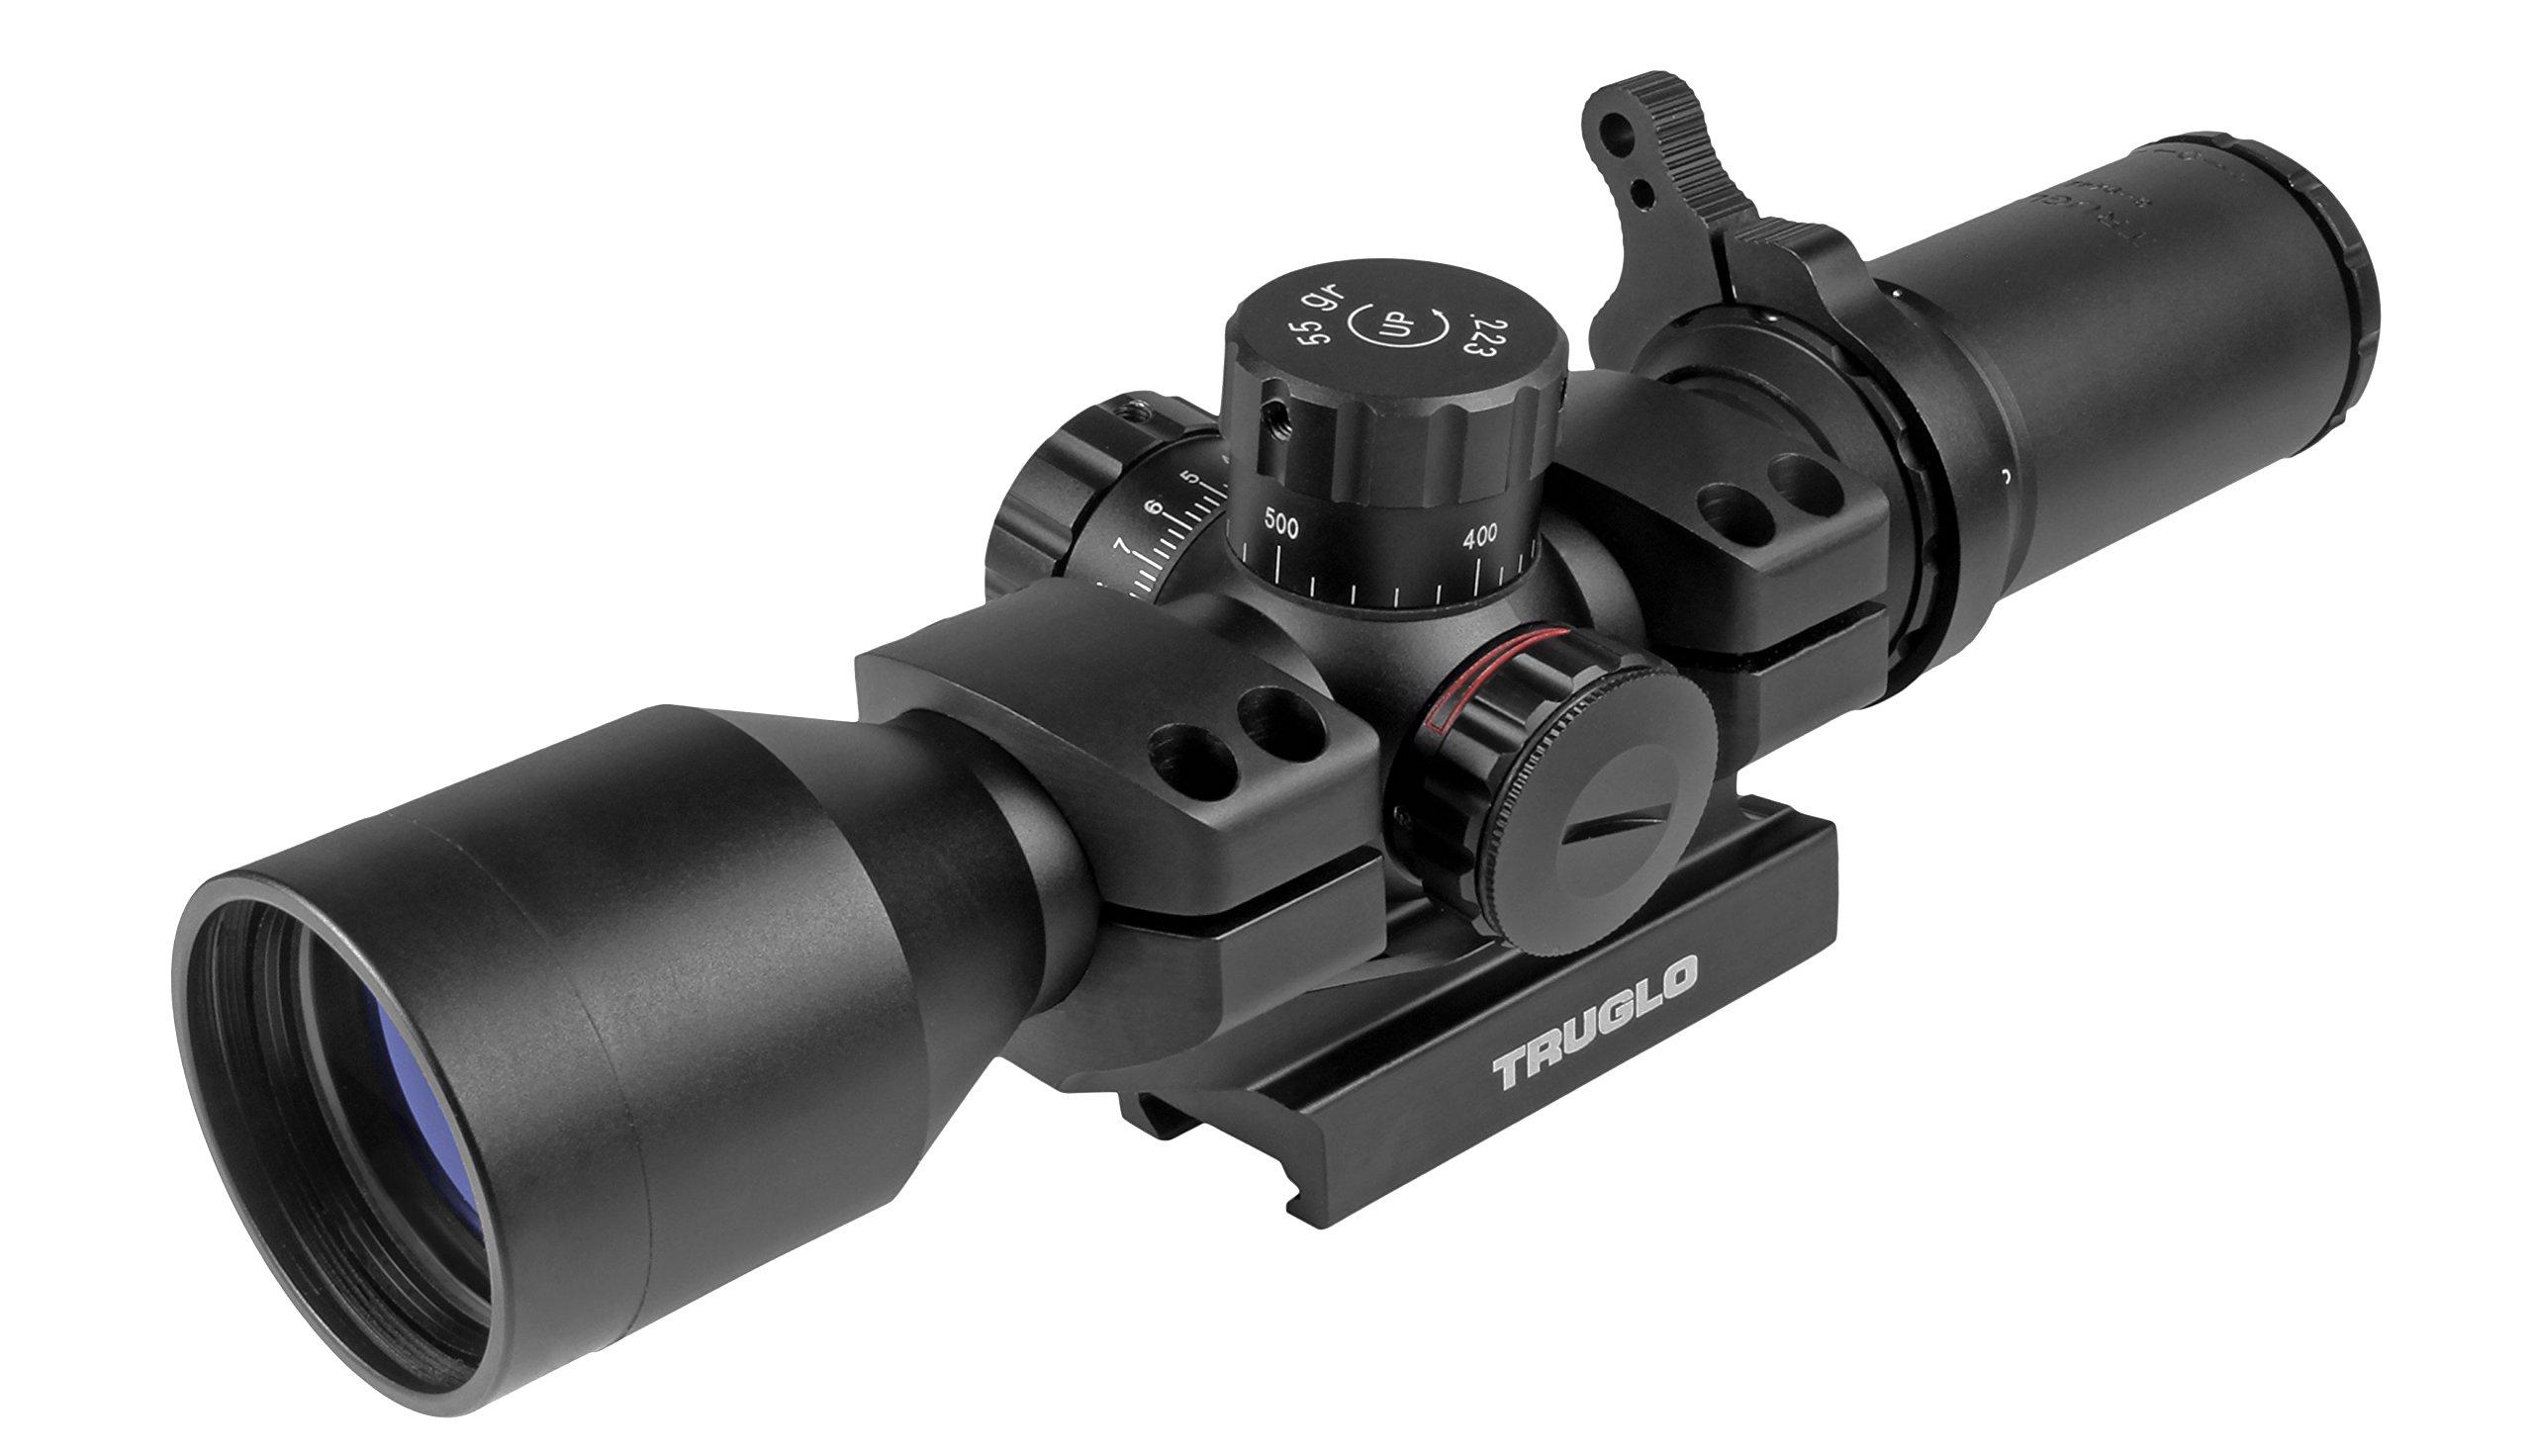 TRUGLO TRU-BRITE 30 Series Illuminated Tactical Rifle Scope - Includes Scope Mount, 3-9 x 42mm by TRUGLO